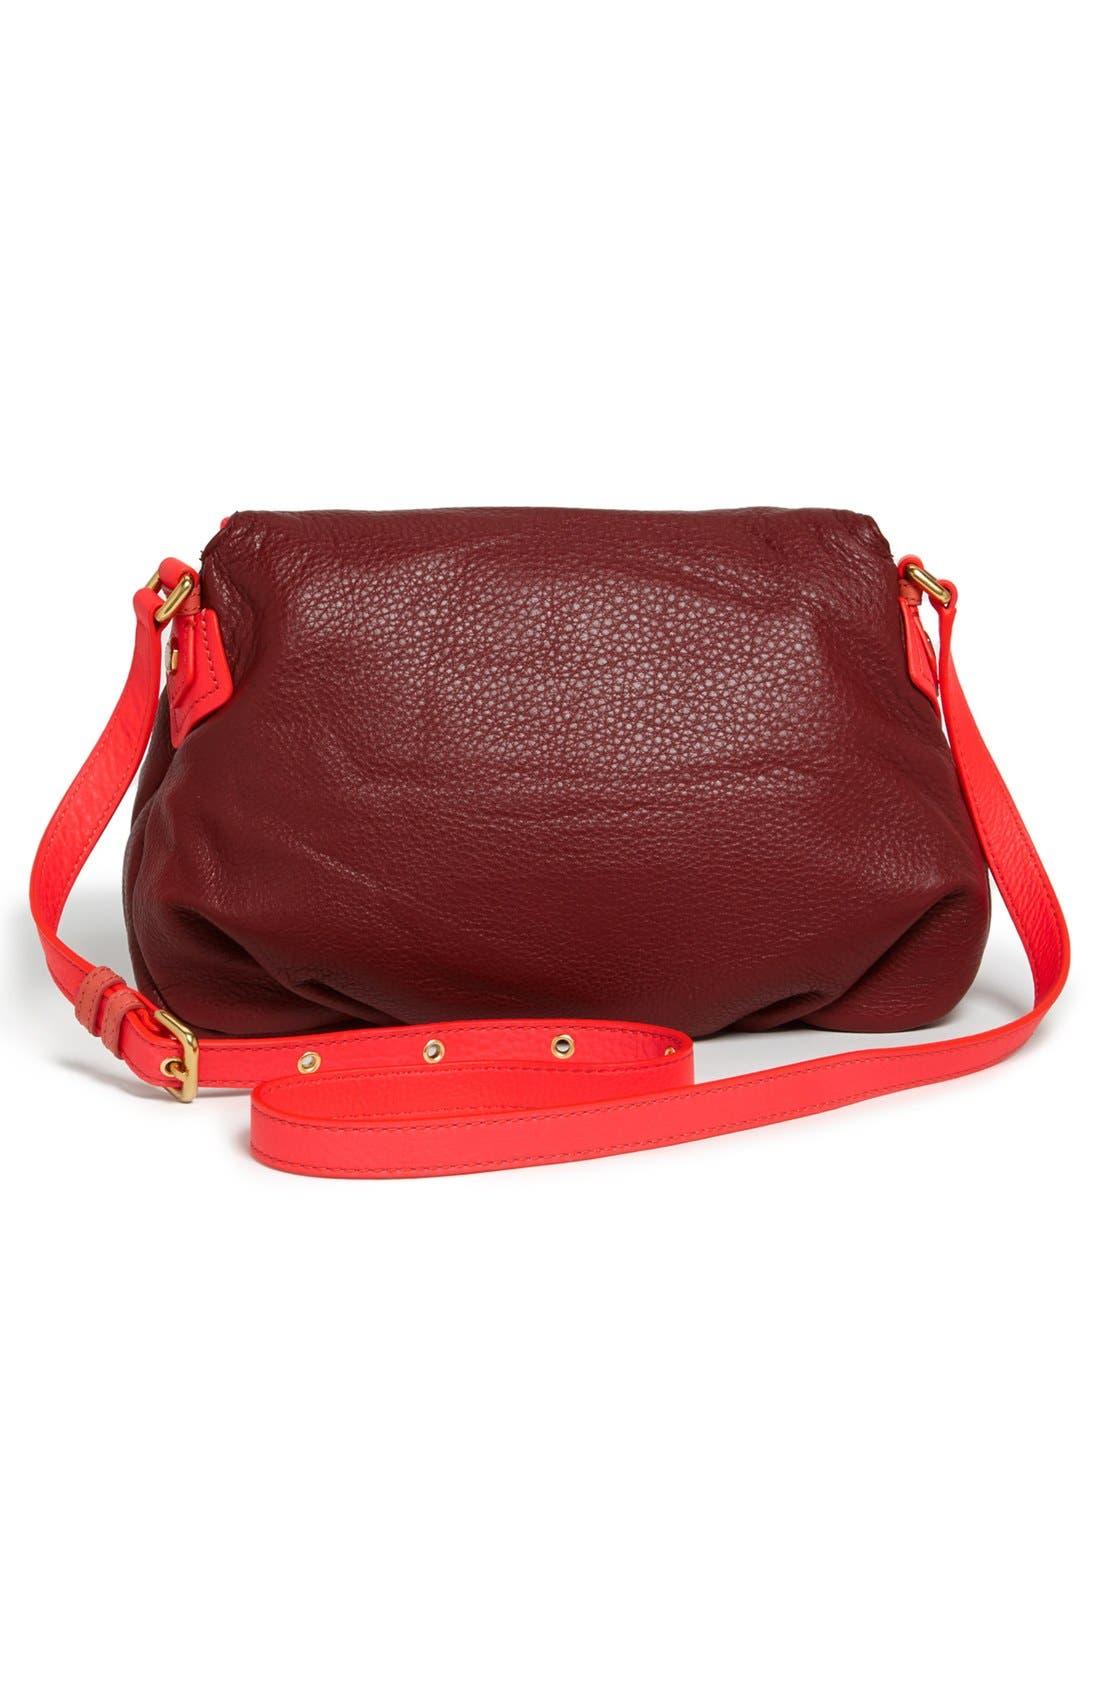 Alternate Image 4  - MARC BY MARC JACOBS 'Classic Q - Natasha' Leather Crossbody Bag